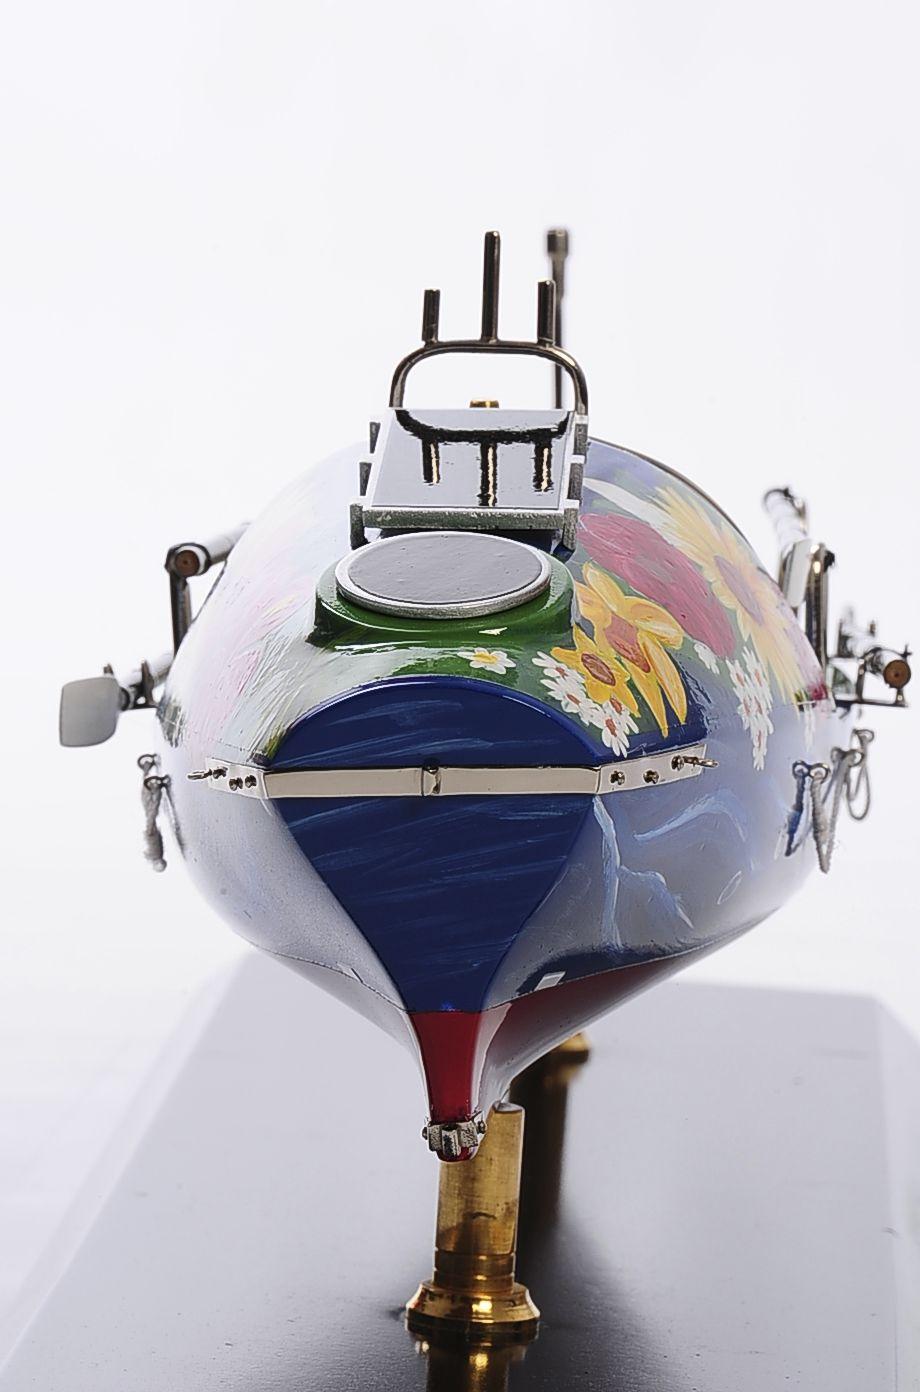 1389-8755-Ocean-Rowing-Boat-Model